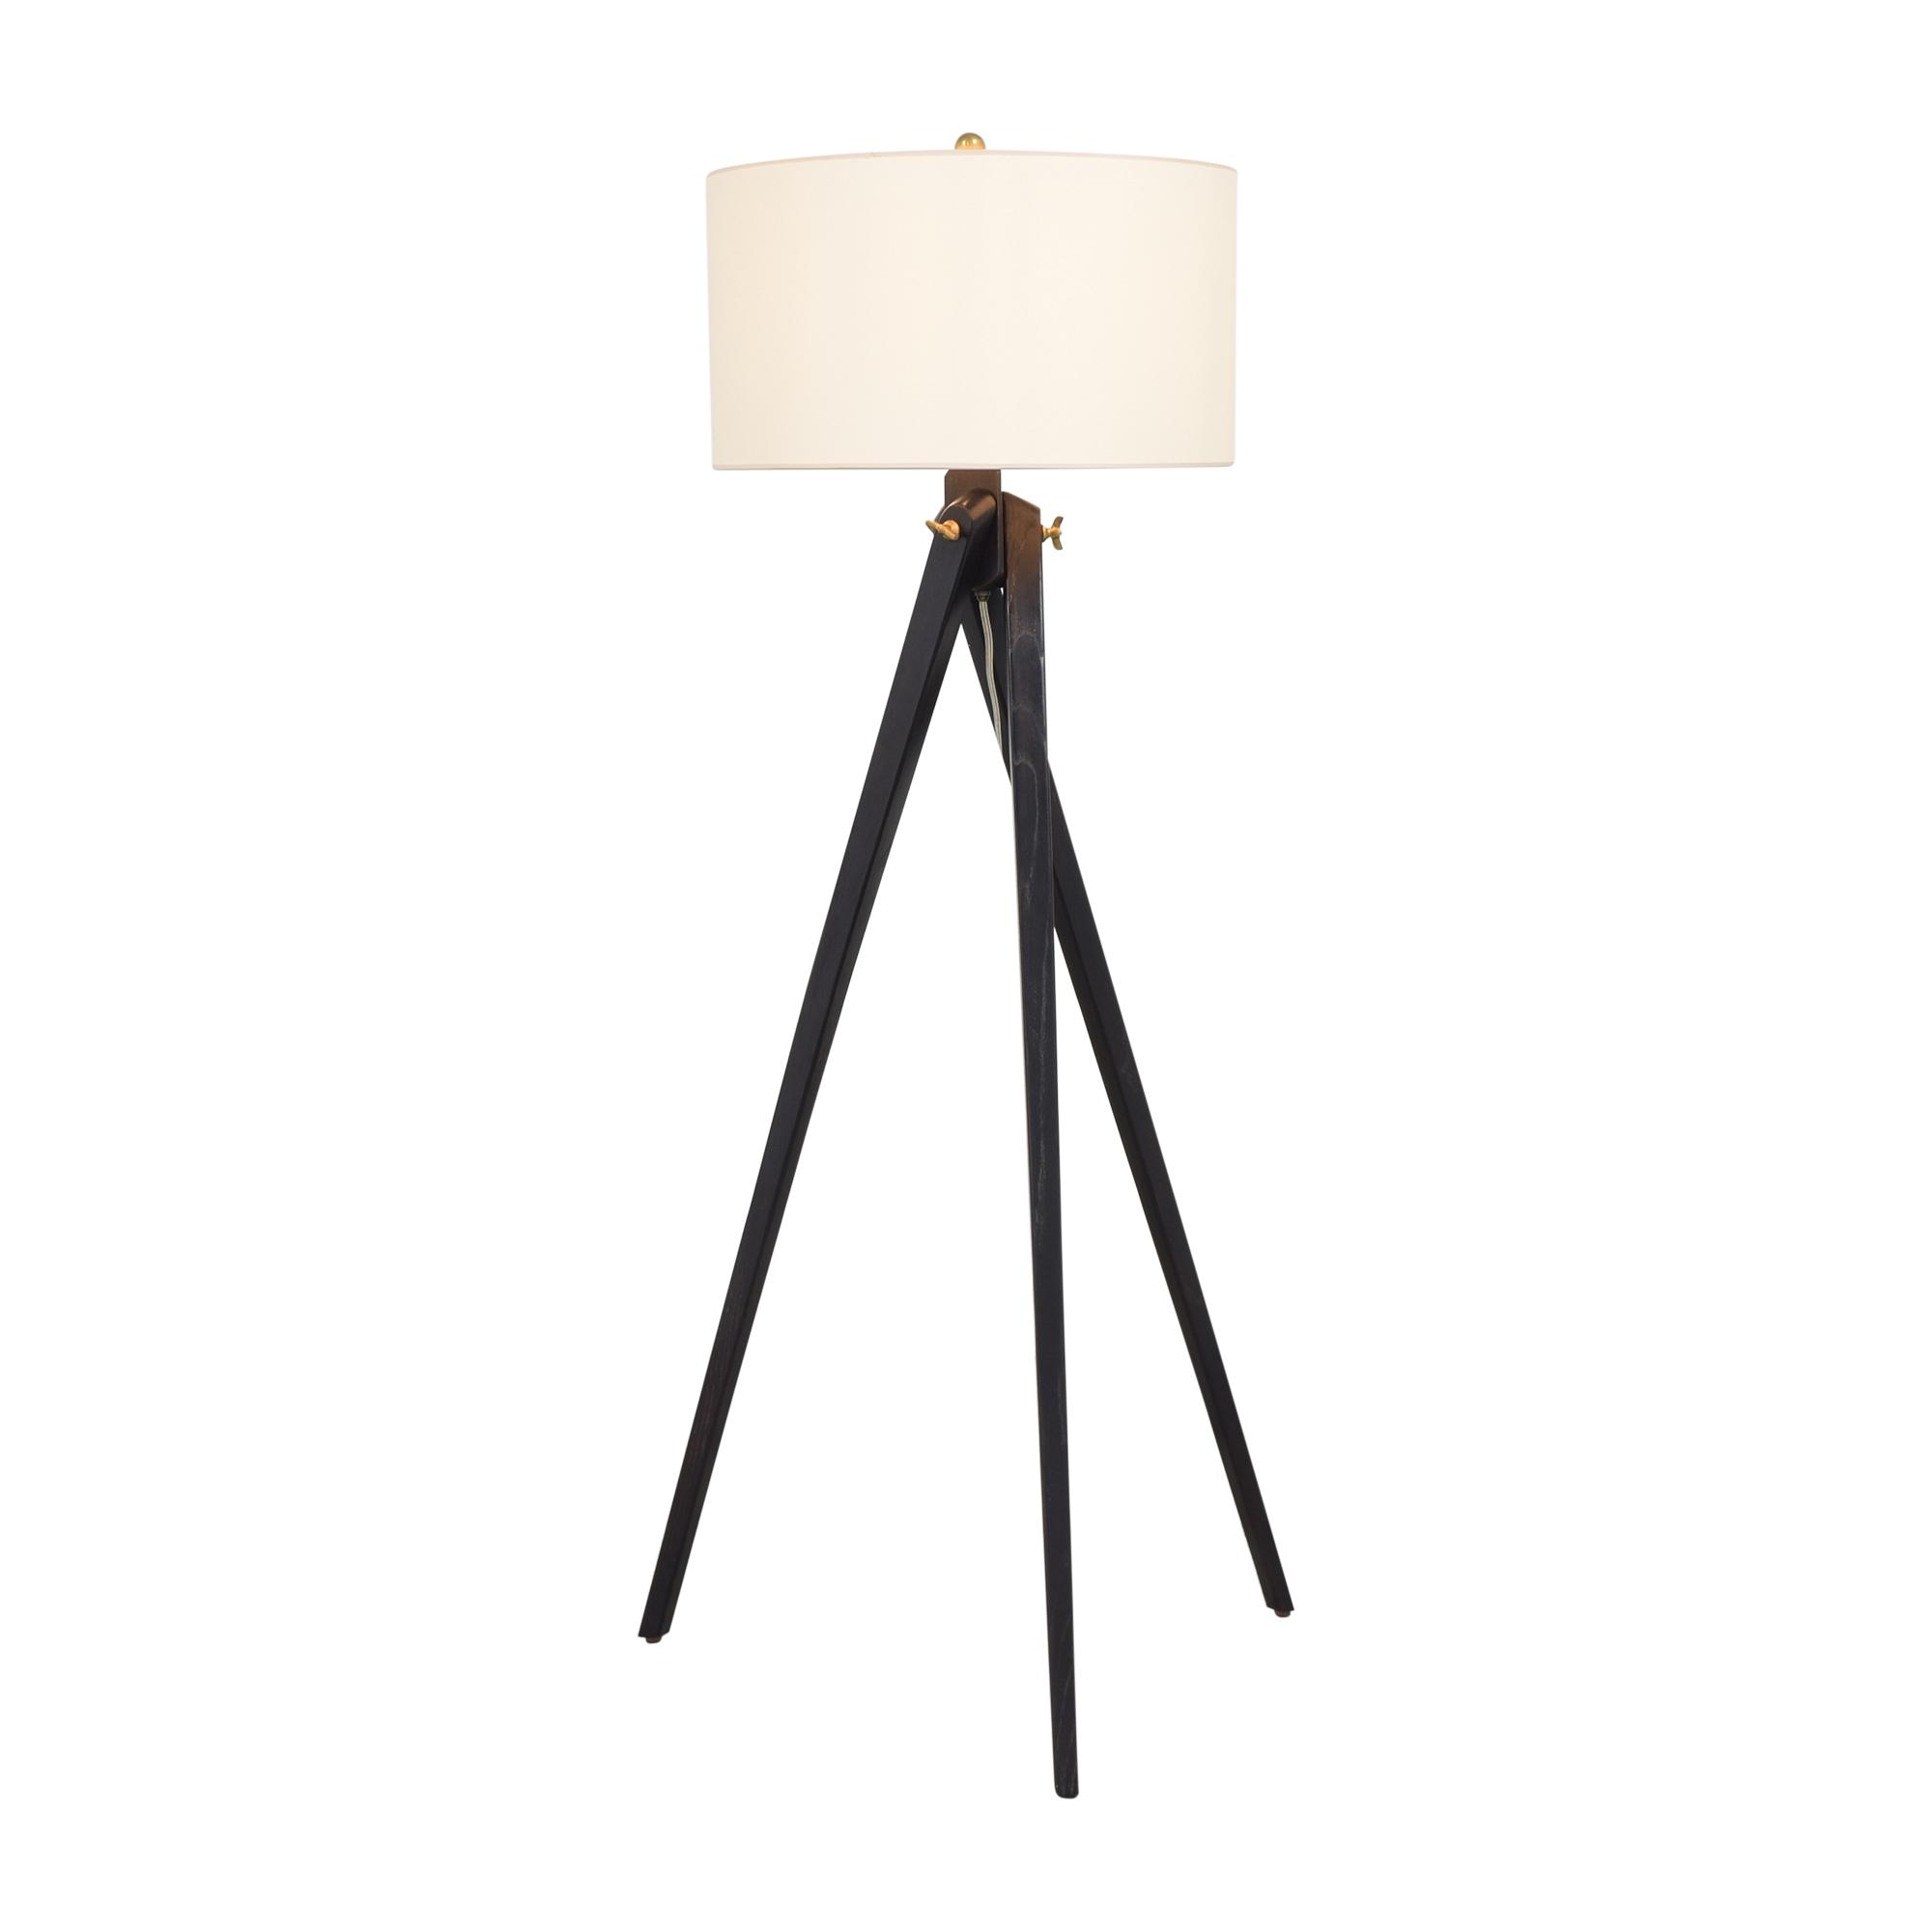 Visual Comfort Visual Comfort York Tripod Floor Lamp black & off white